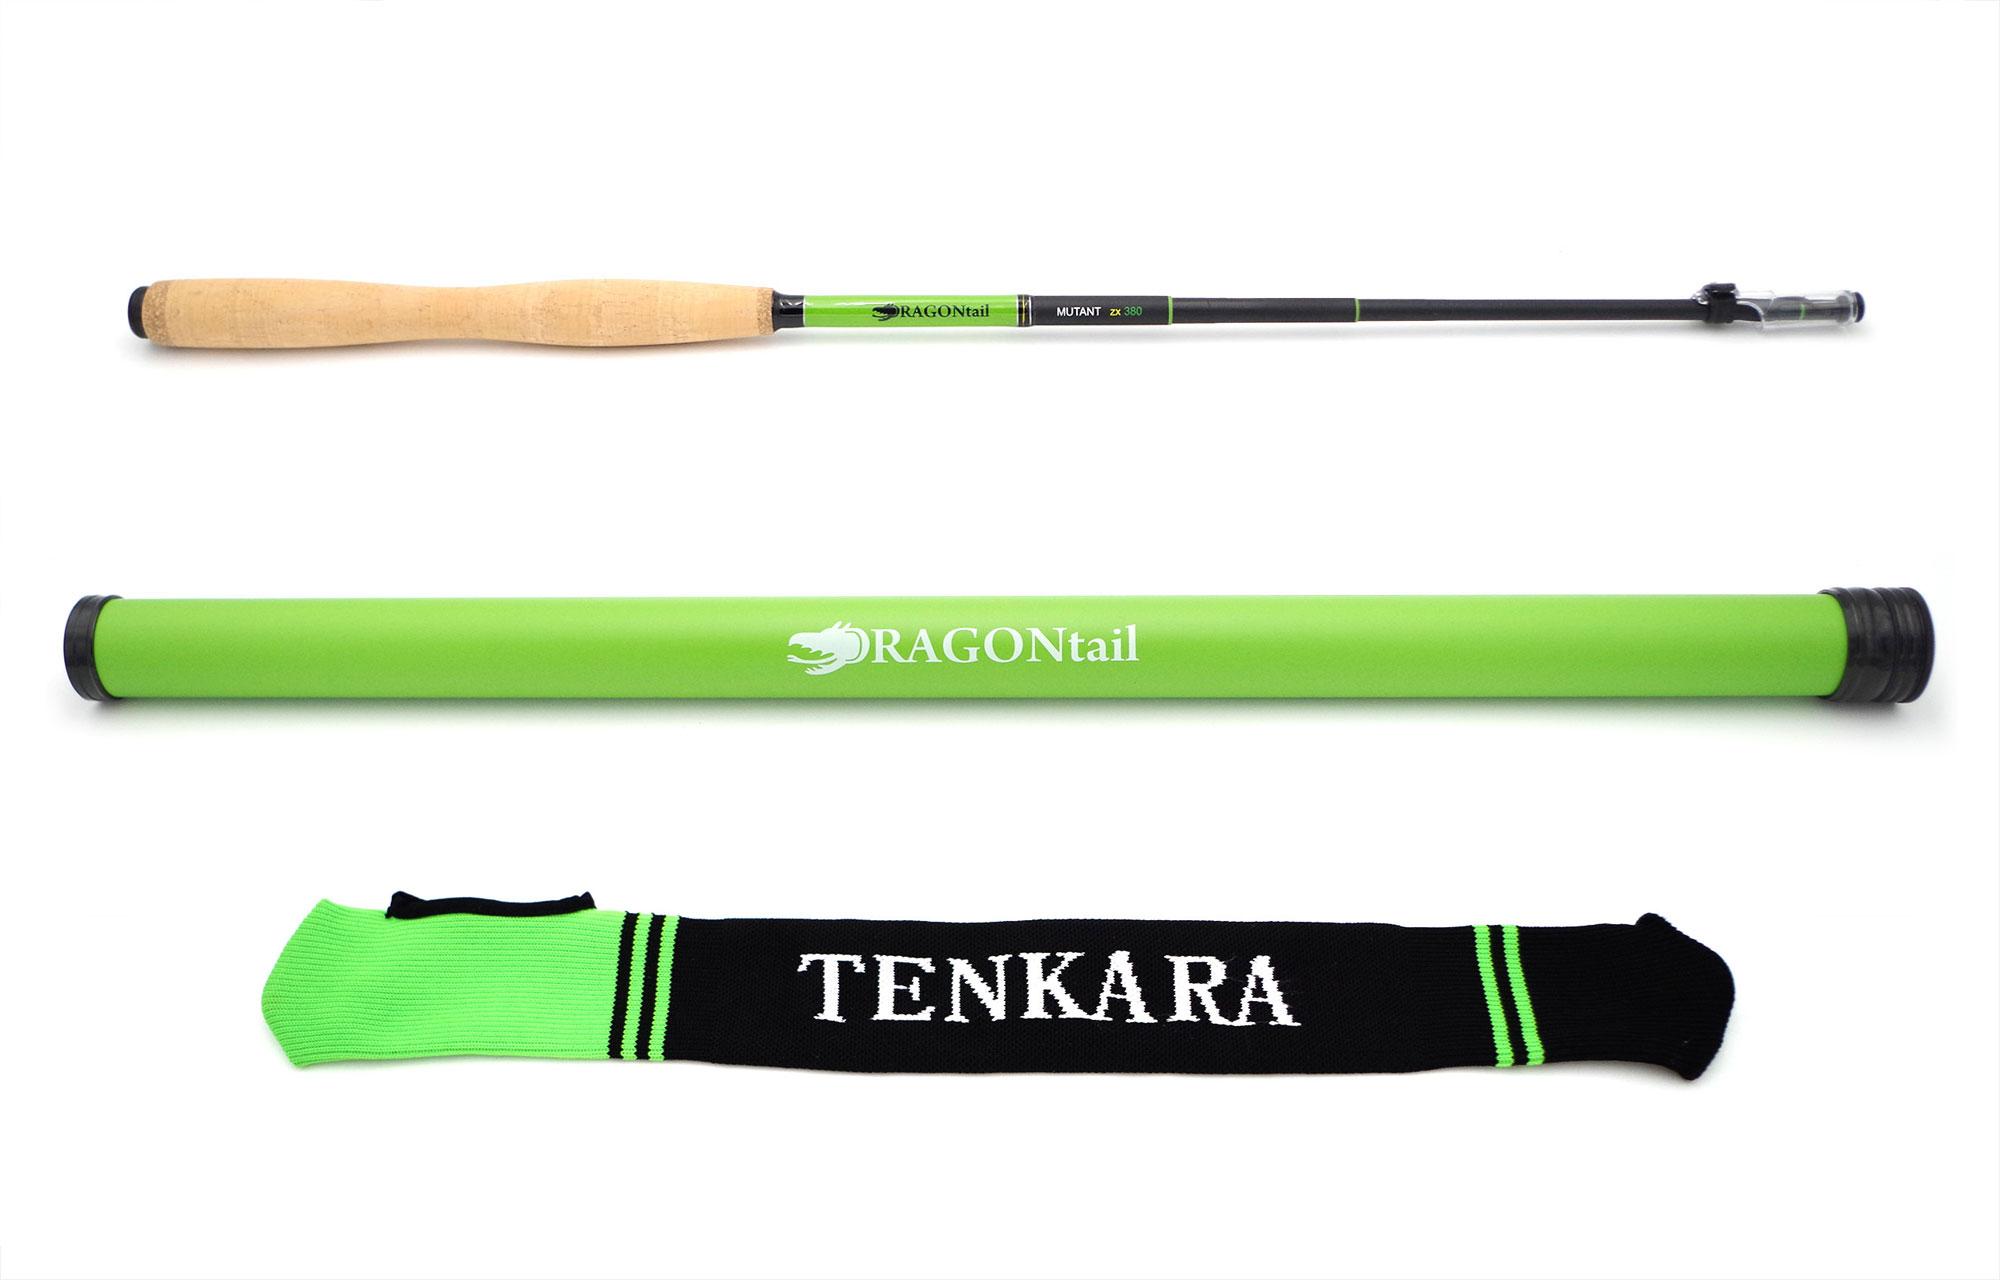 Tenkara Angler Gift Guide - Dragontail Mutant Rod